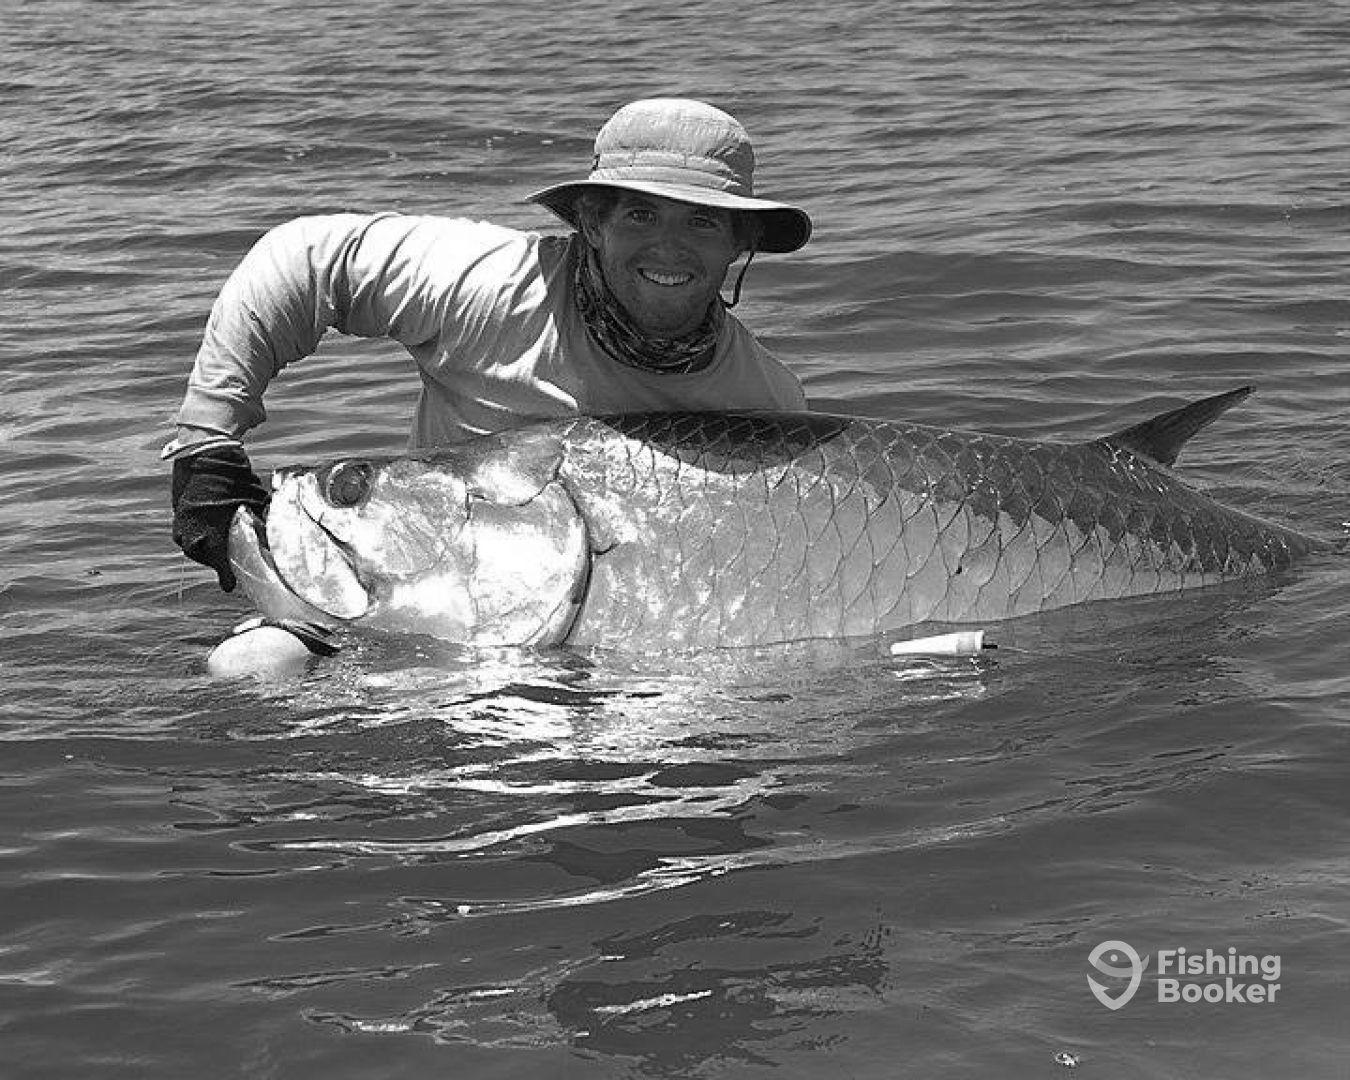 Grey ghost fishing charters stuart fl fishingbooker for Stuart fishing charter